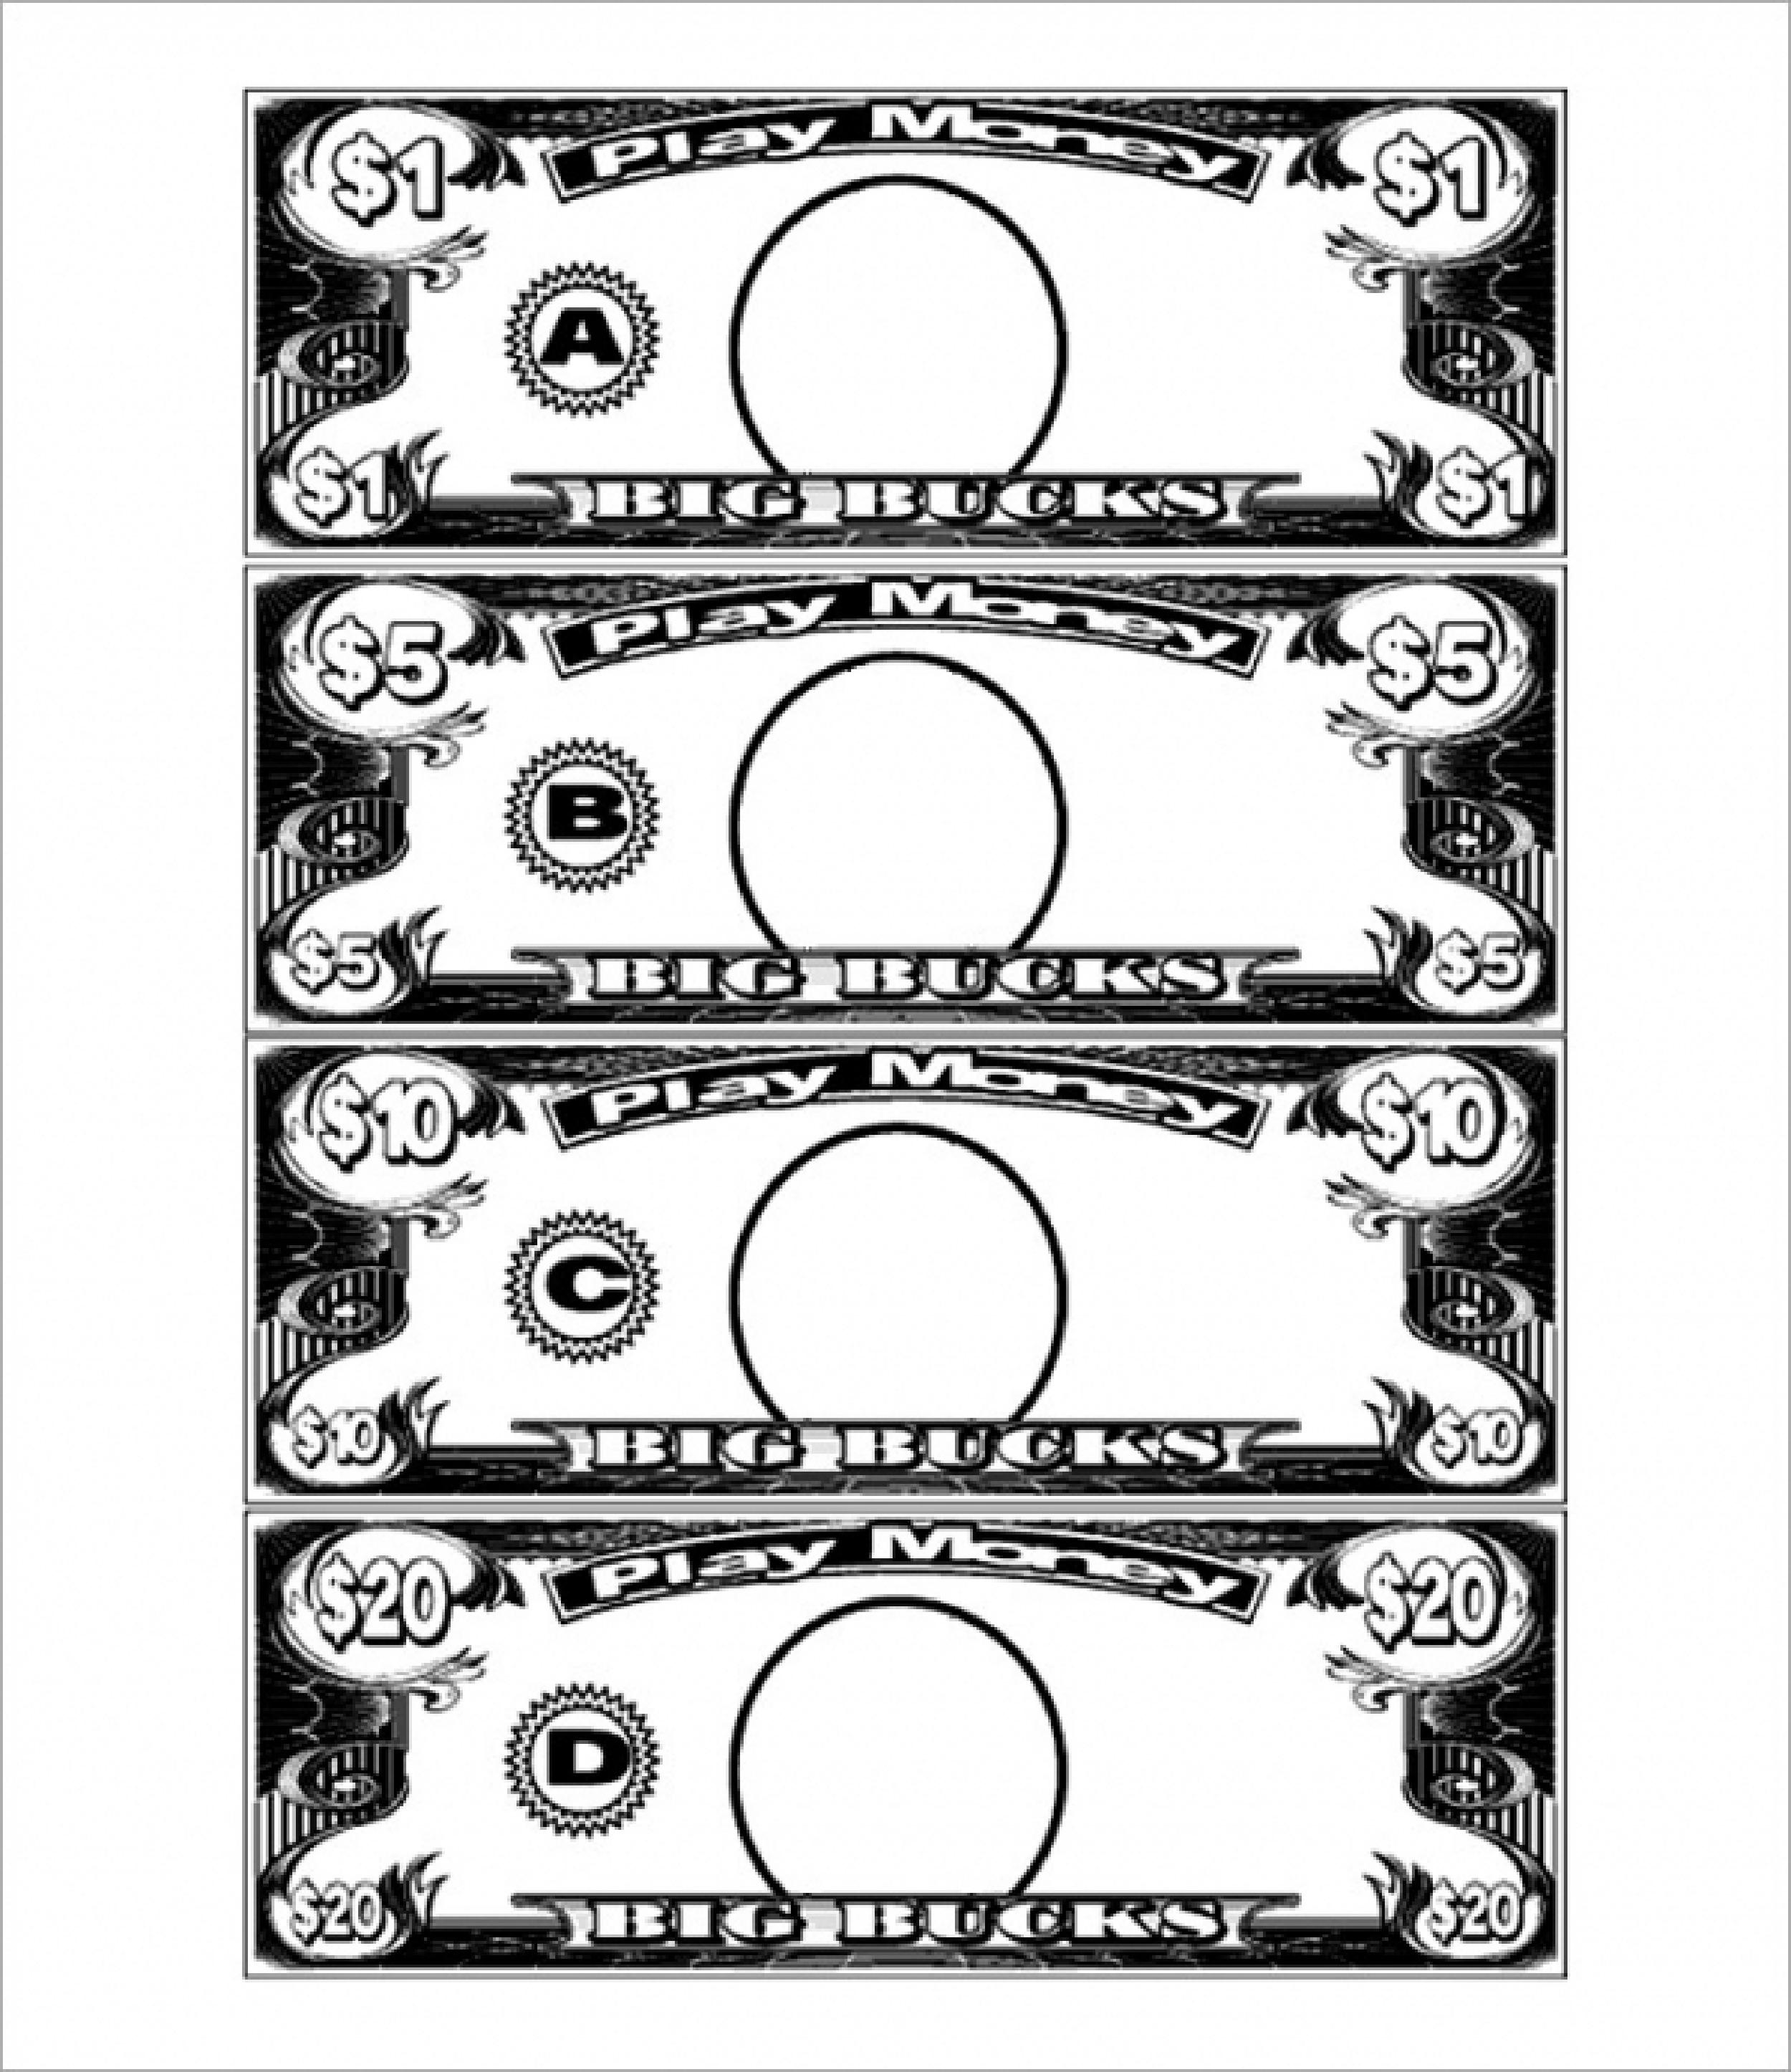 Free 20 Bucks Play Money Template | Templates At - Free Printable Play Money